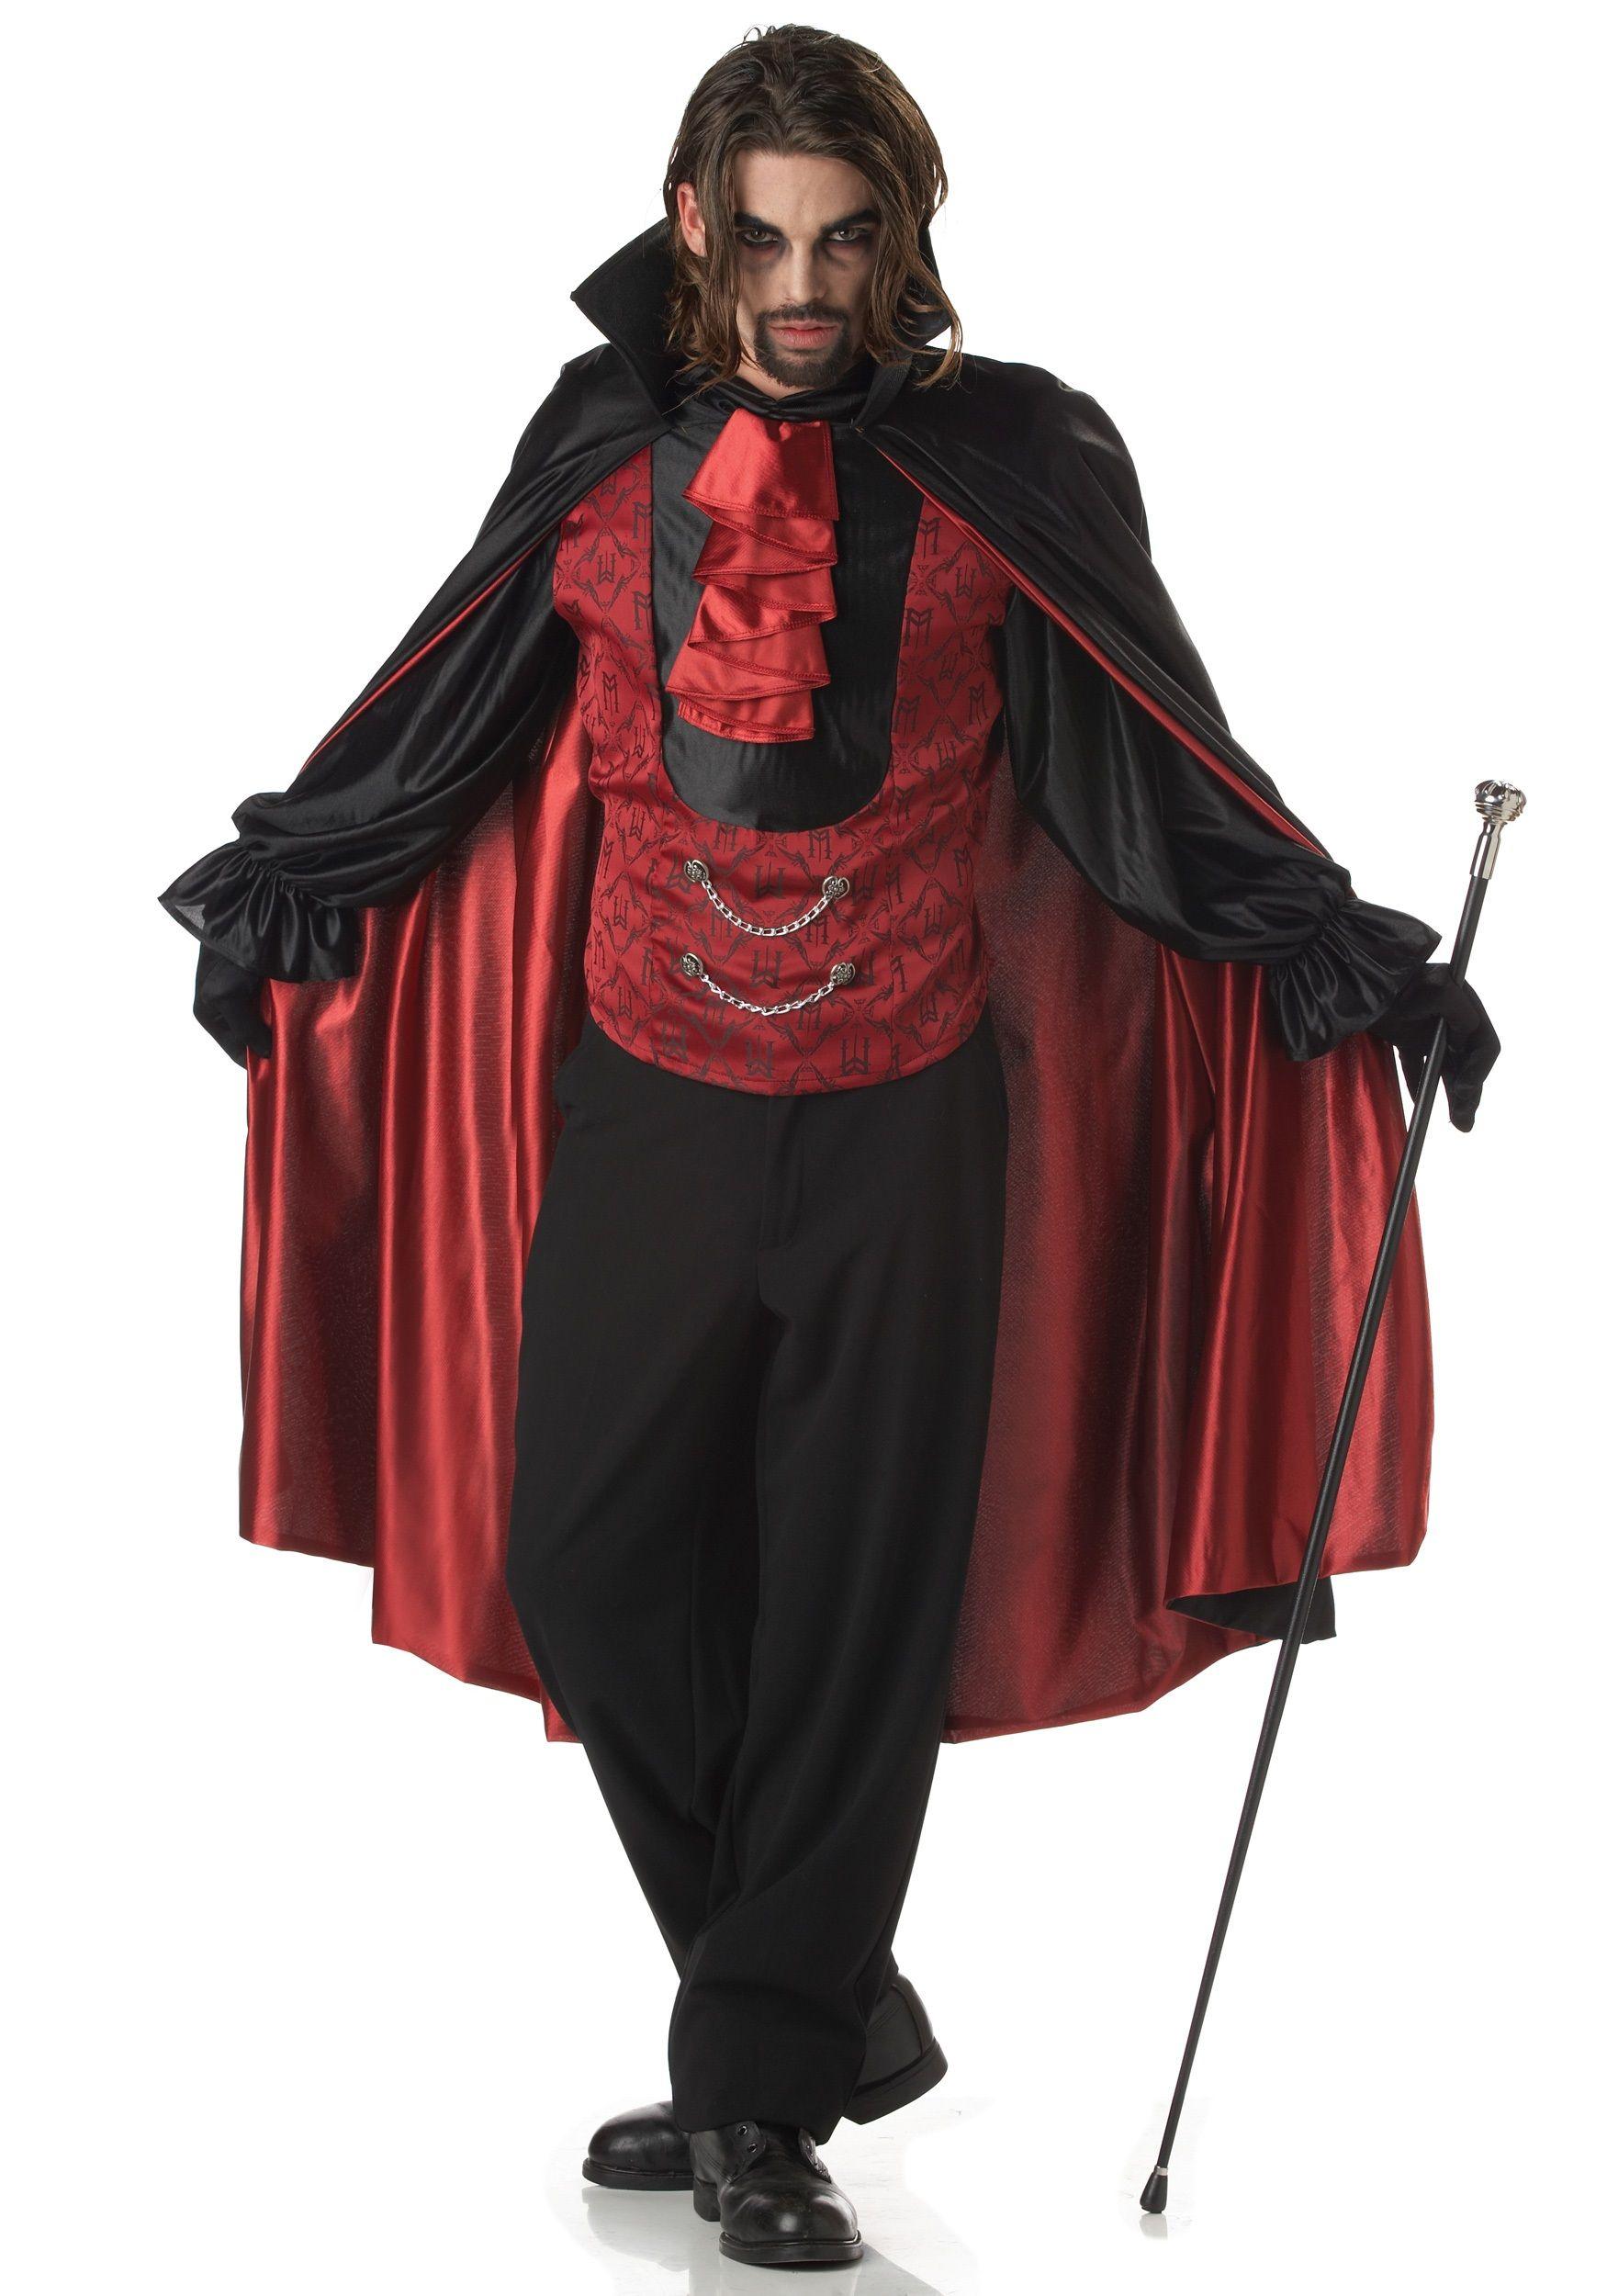 Classic Adult Vampire Costume | Vampire costumes, Wizard costume ...